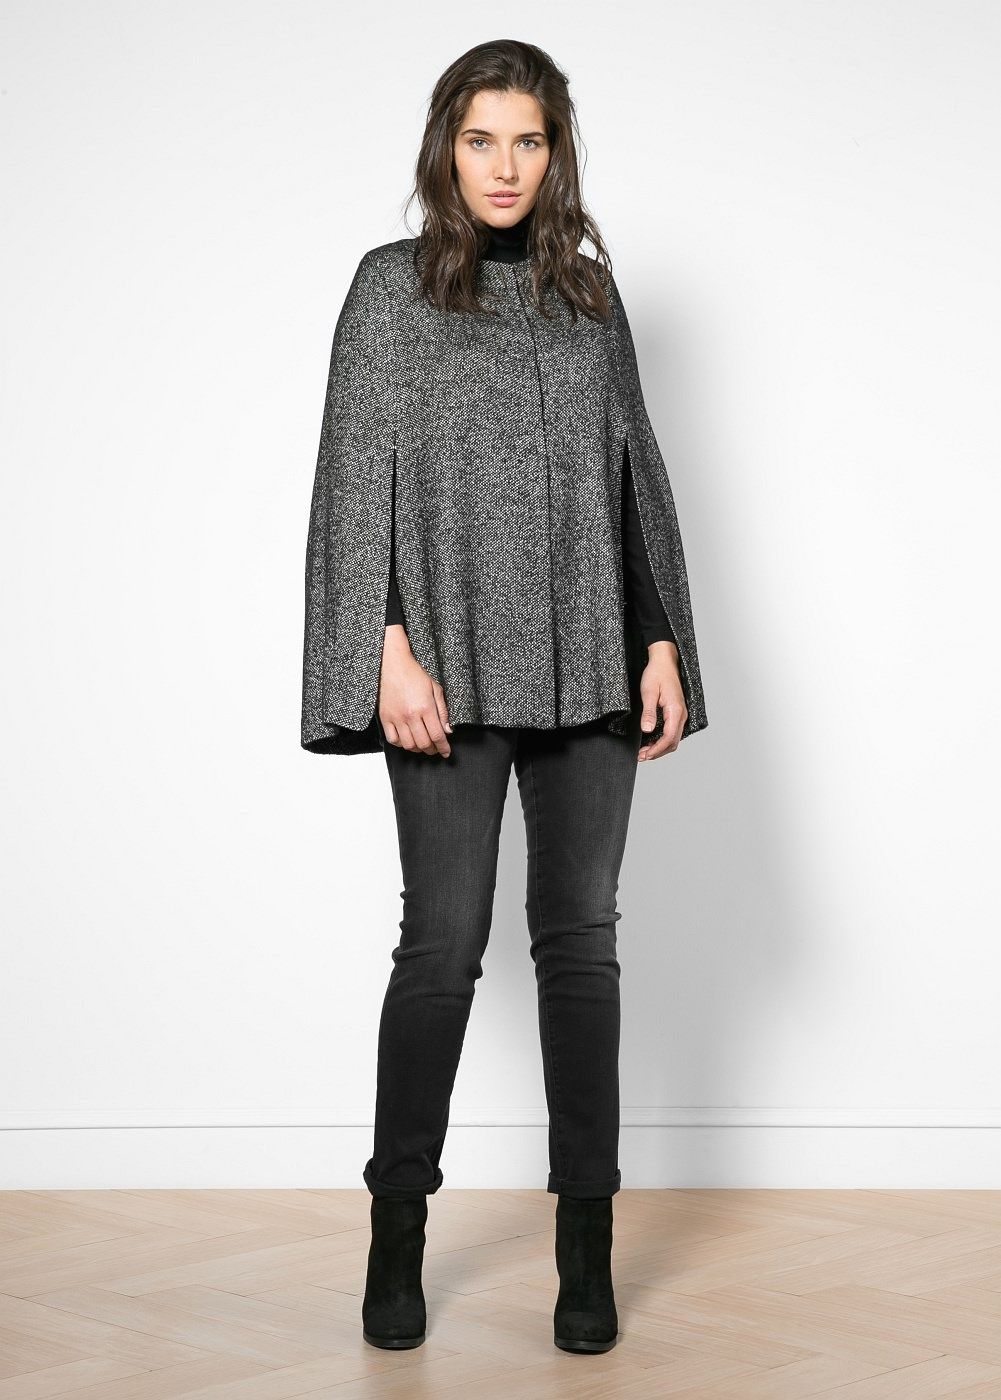 2c6a346fbe02 Cashmere wool-blend cape - Plus sizes